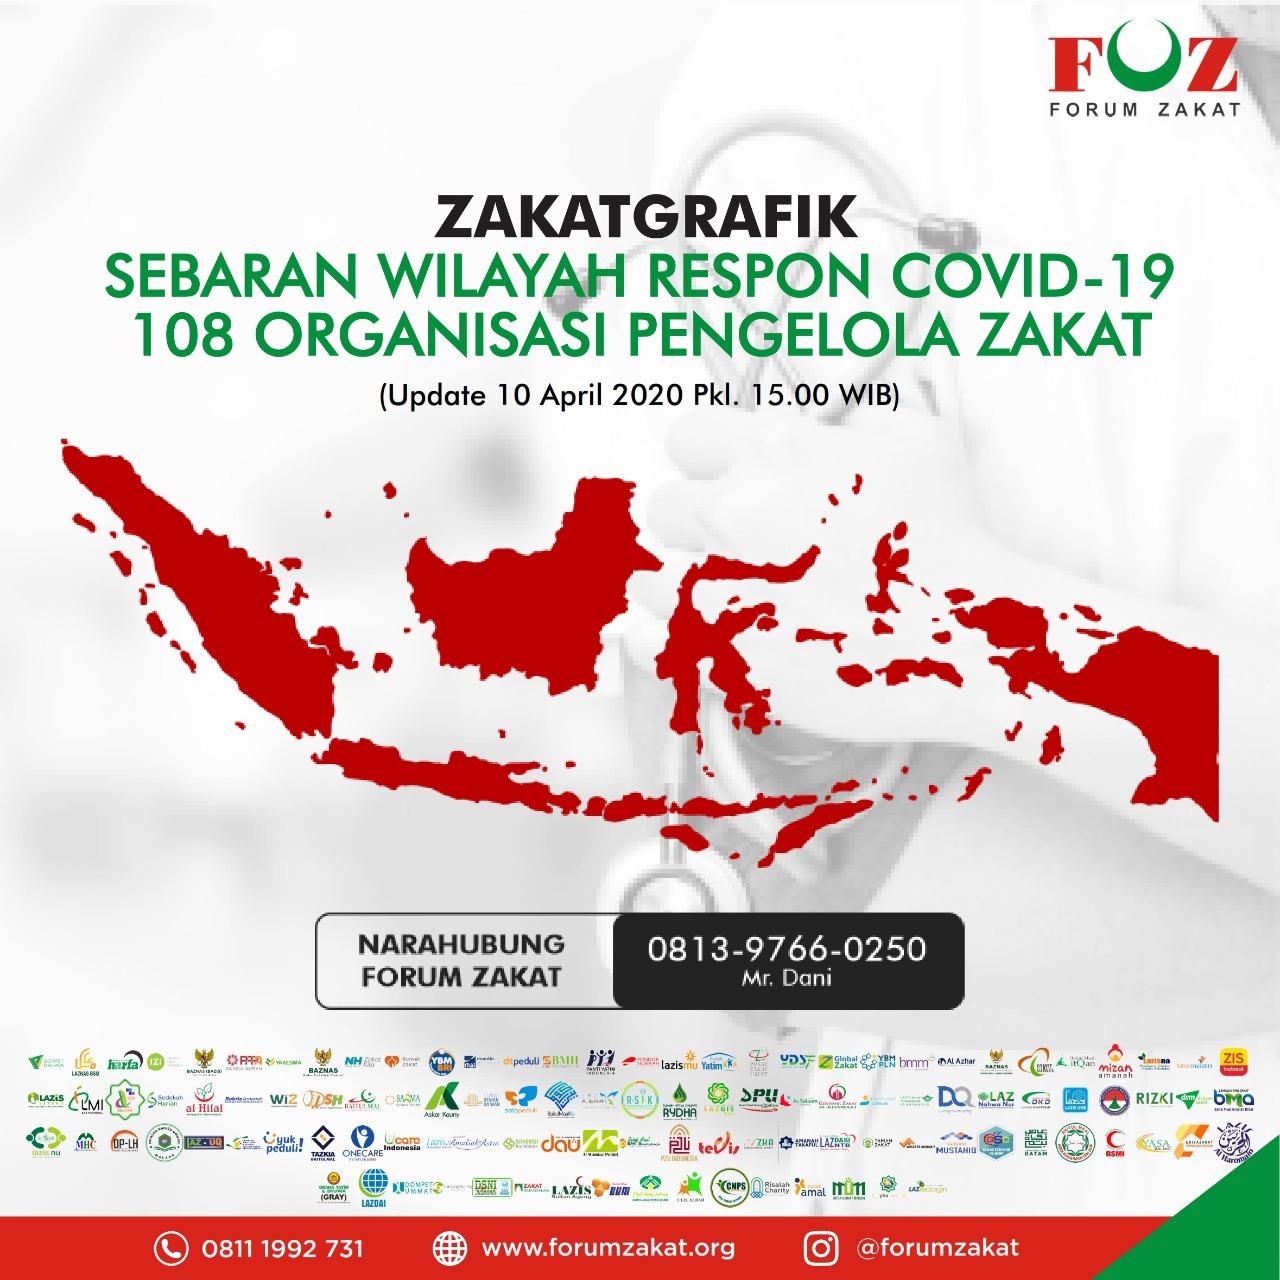 Crisis Center Covid-19 : Forum Zakat Koordinasikan OPZ di Seluruh Indonesia Respon Covid-19